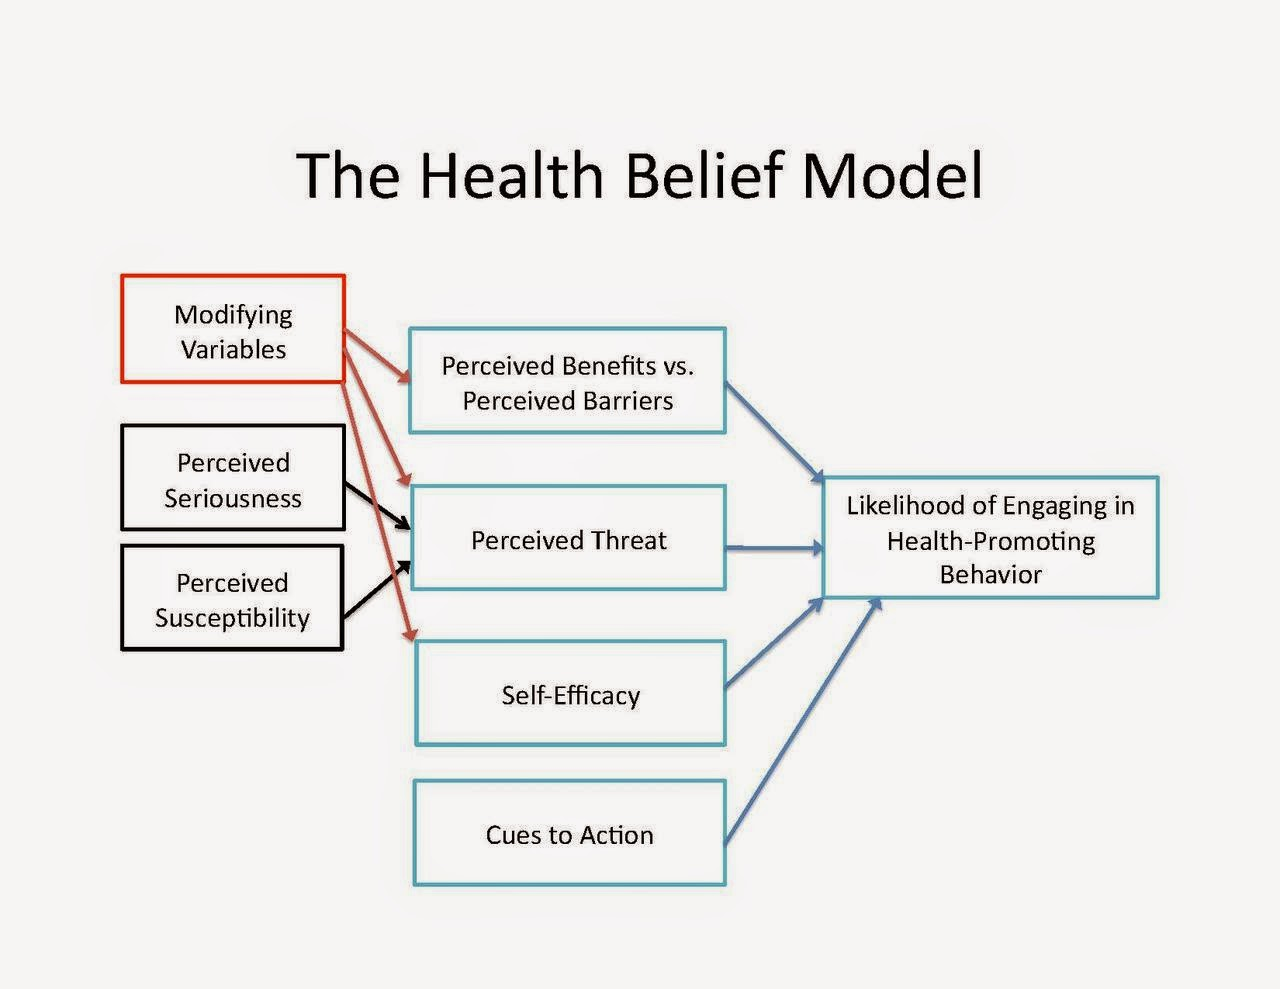 https://www.google.co.uk/search?q=health+belief+model&espv=2&biw=1920&bih=955&source=lnms&tbm=isch&sa=X&ei=jiwoVcT3K8HhaPzAgNgJ&ved=0CAYQ_AUoAQ#imgrc=922gqPb-k-kz0M%253A%3B1utuHLlvIQUhnM%3Bhttp%253A%252F%252Fupload.wikimedia.org%252Fwikipedia%252Fcommons%252Fthumb%252F7%252F7a%252FThe_Health_Belief_Model.pdf%252Fpage1-1280px-The_Health_Belief_Model.pdf.jpg%3Bhttp%253A%252F%252Fen.wikipedia.org%252Fwiki%252FHealth_belief_model%3B1280%3B989